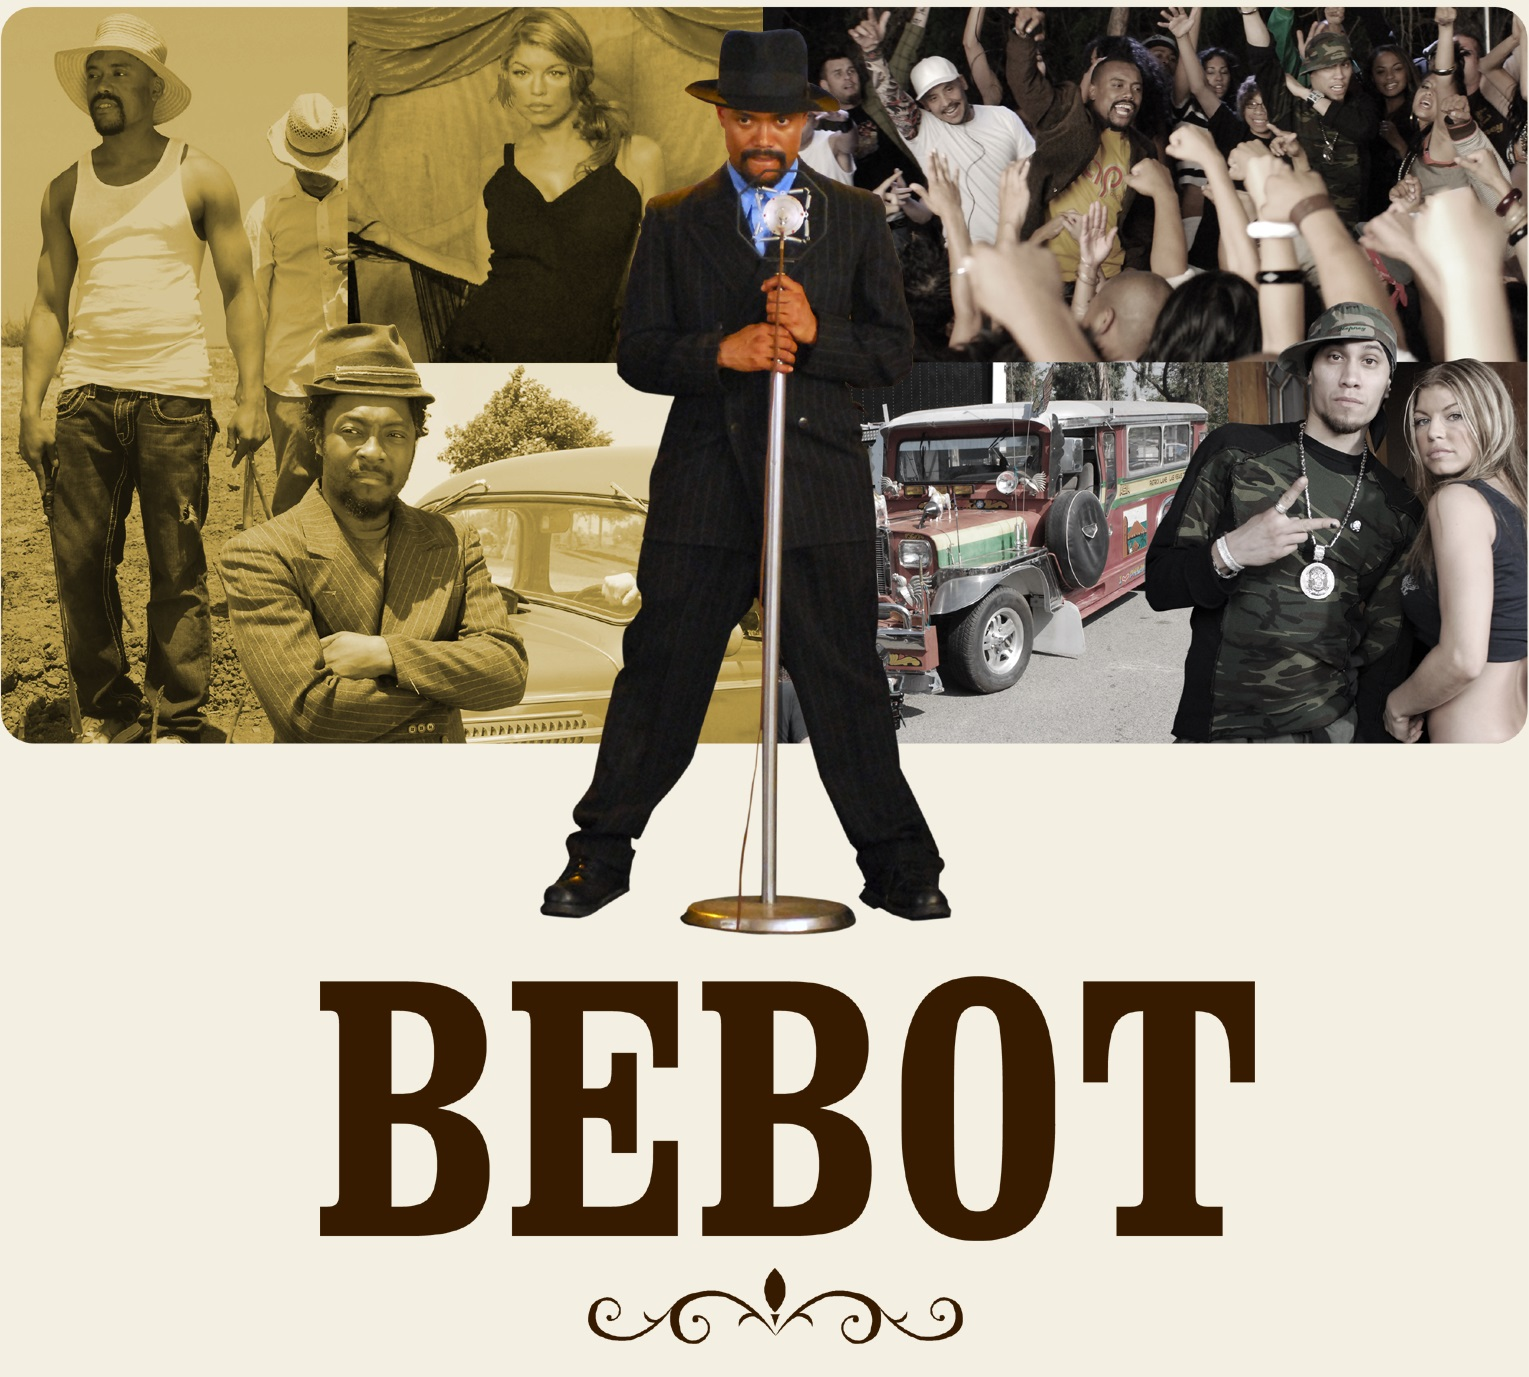 bebot dating site